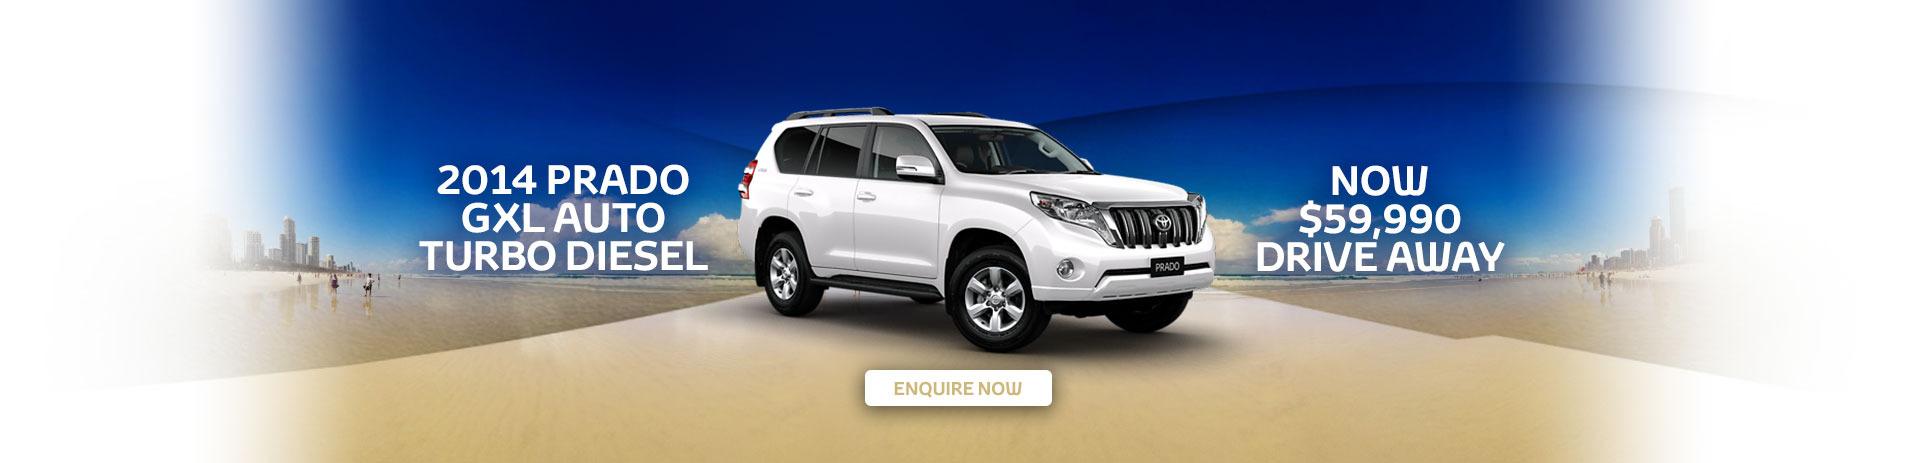 Toyota Prado GXL Deal